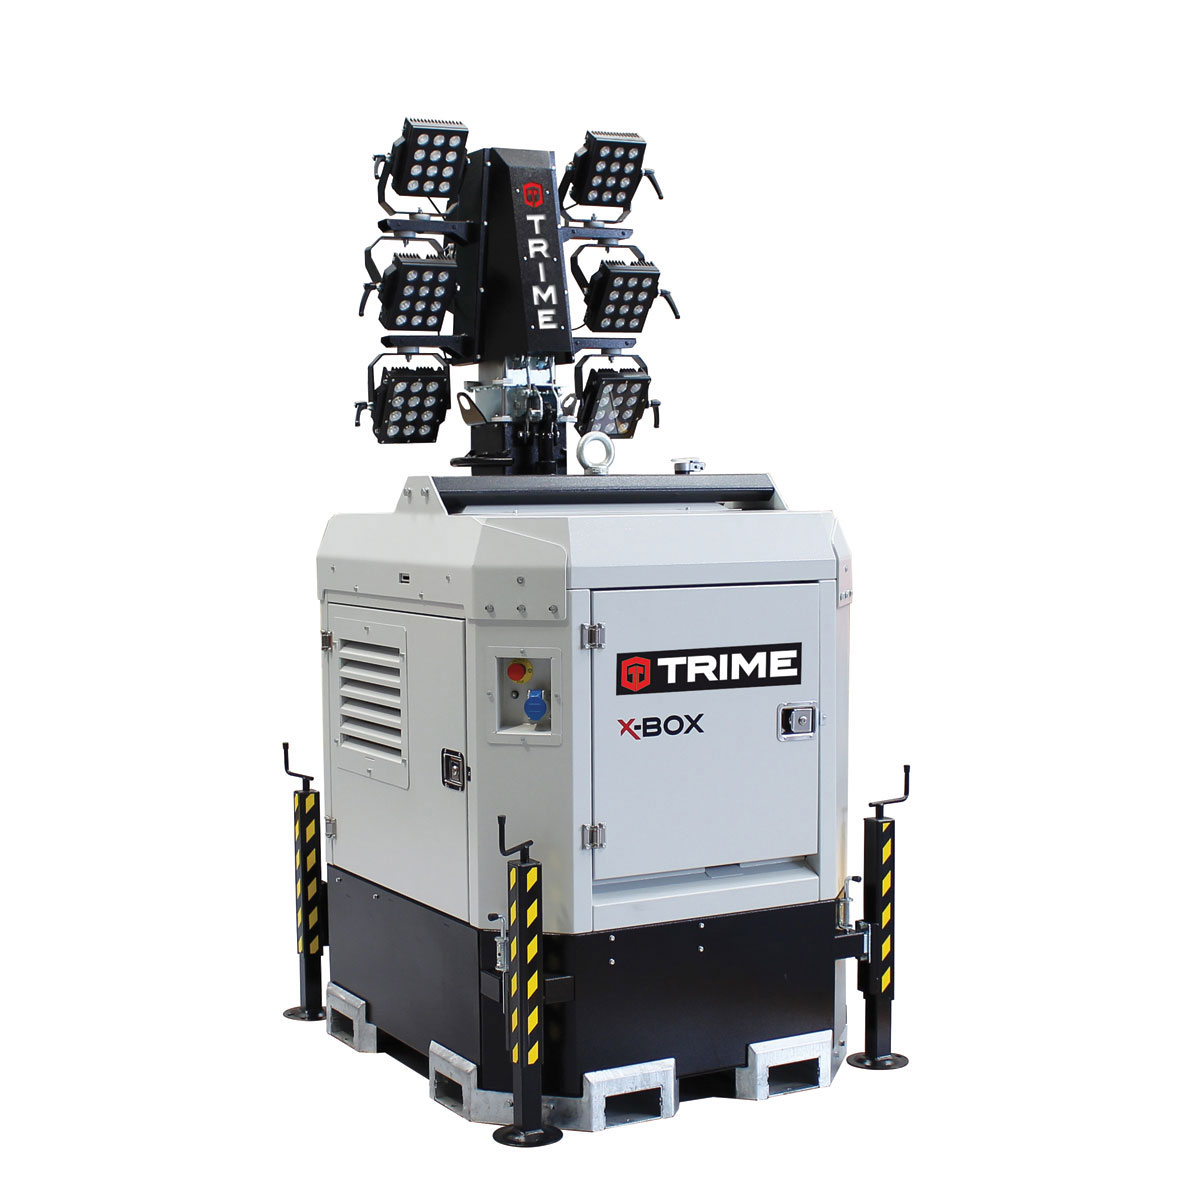 belysningsmast-led-x-box-6x150W-48V-stangd